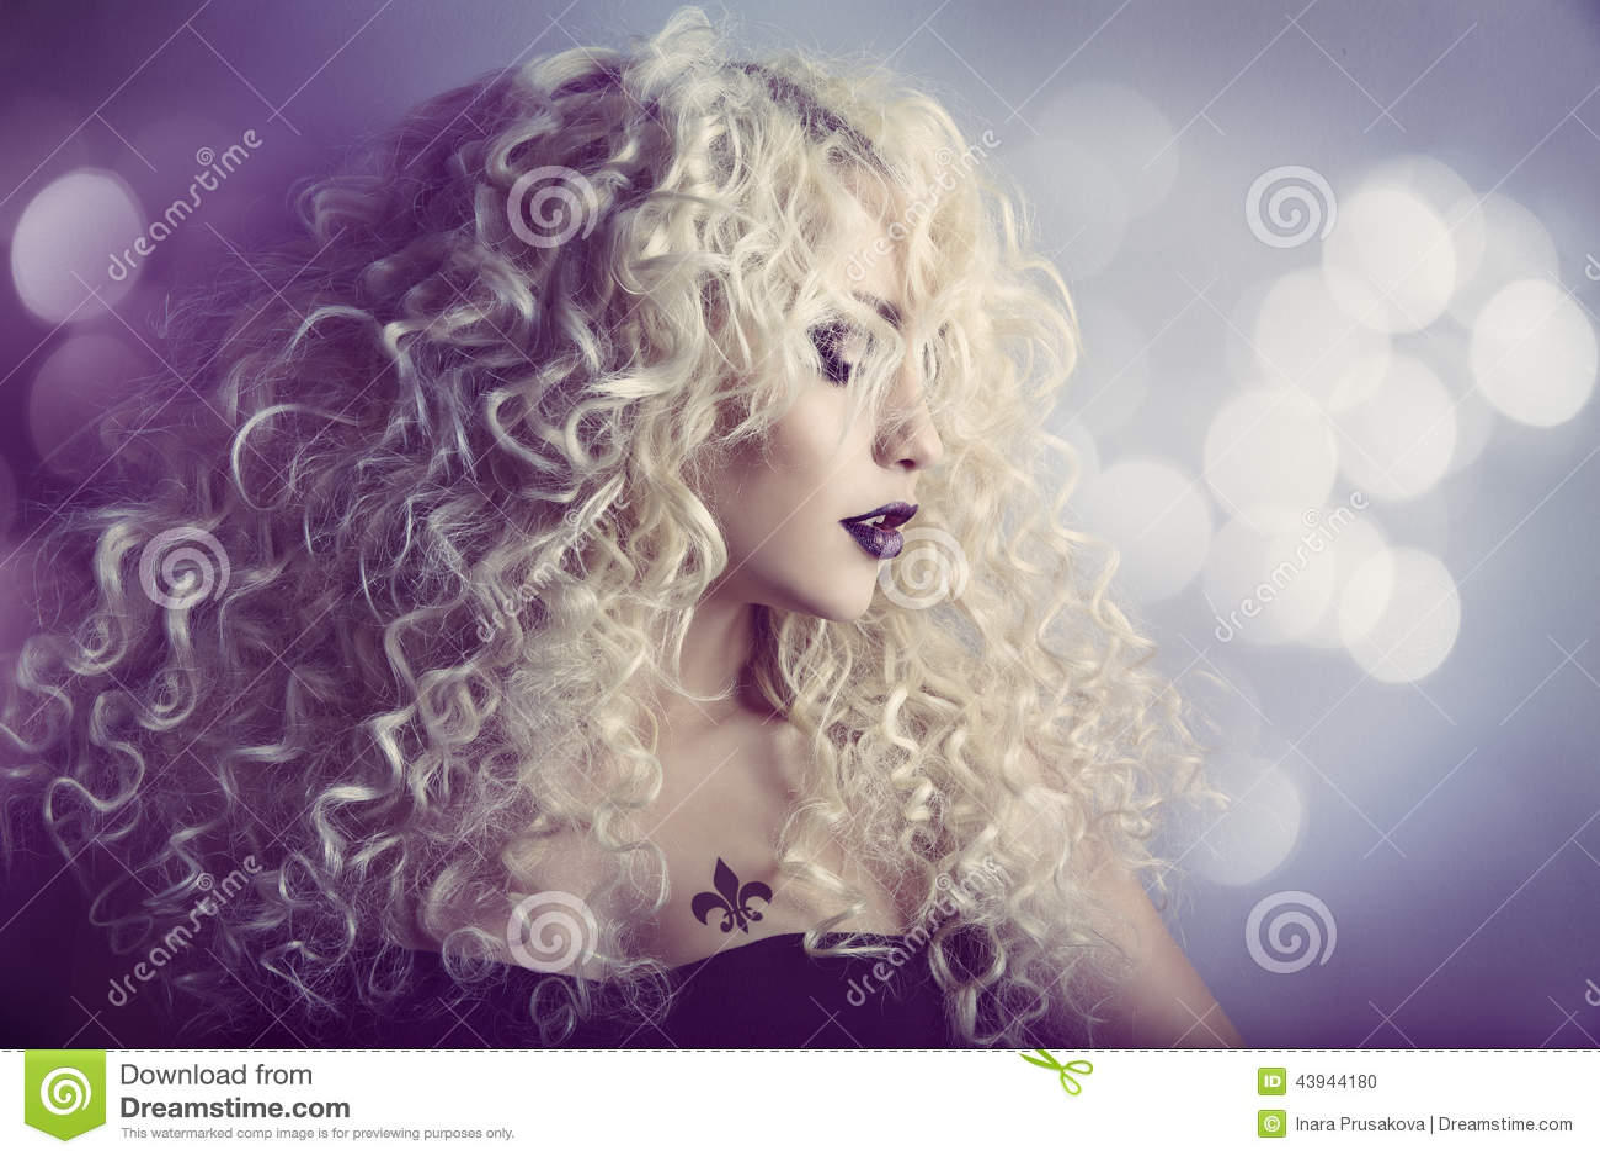 Woman Fashion Beauty Portrait, Model Girl Hairstyle, Blond